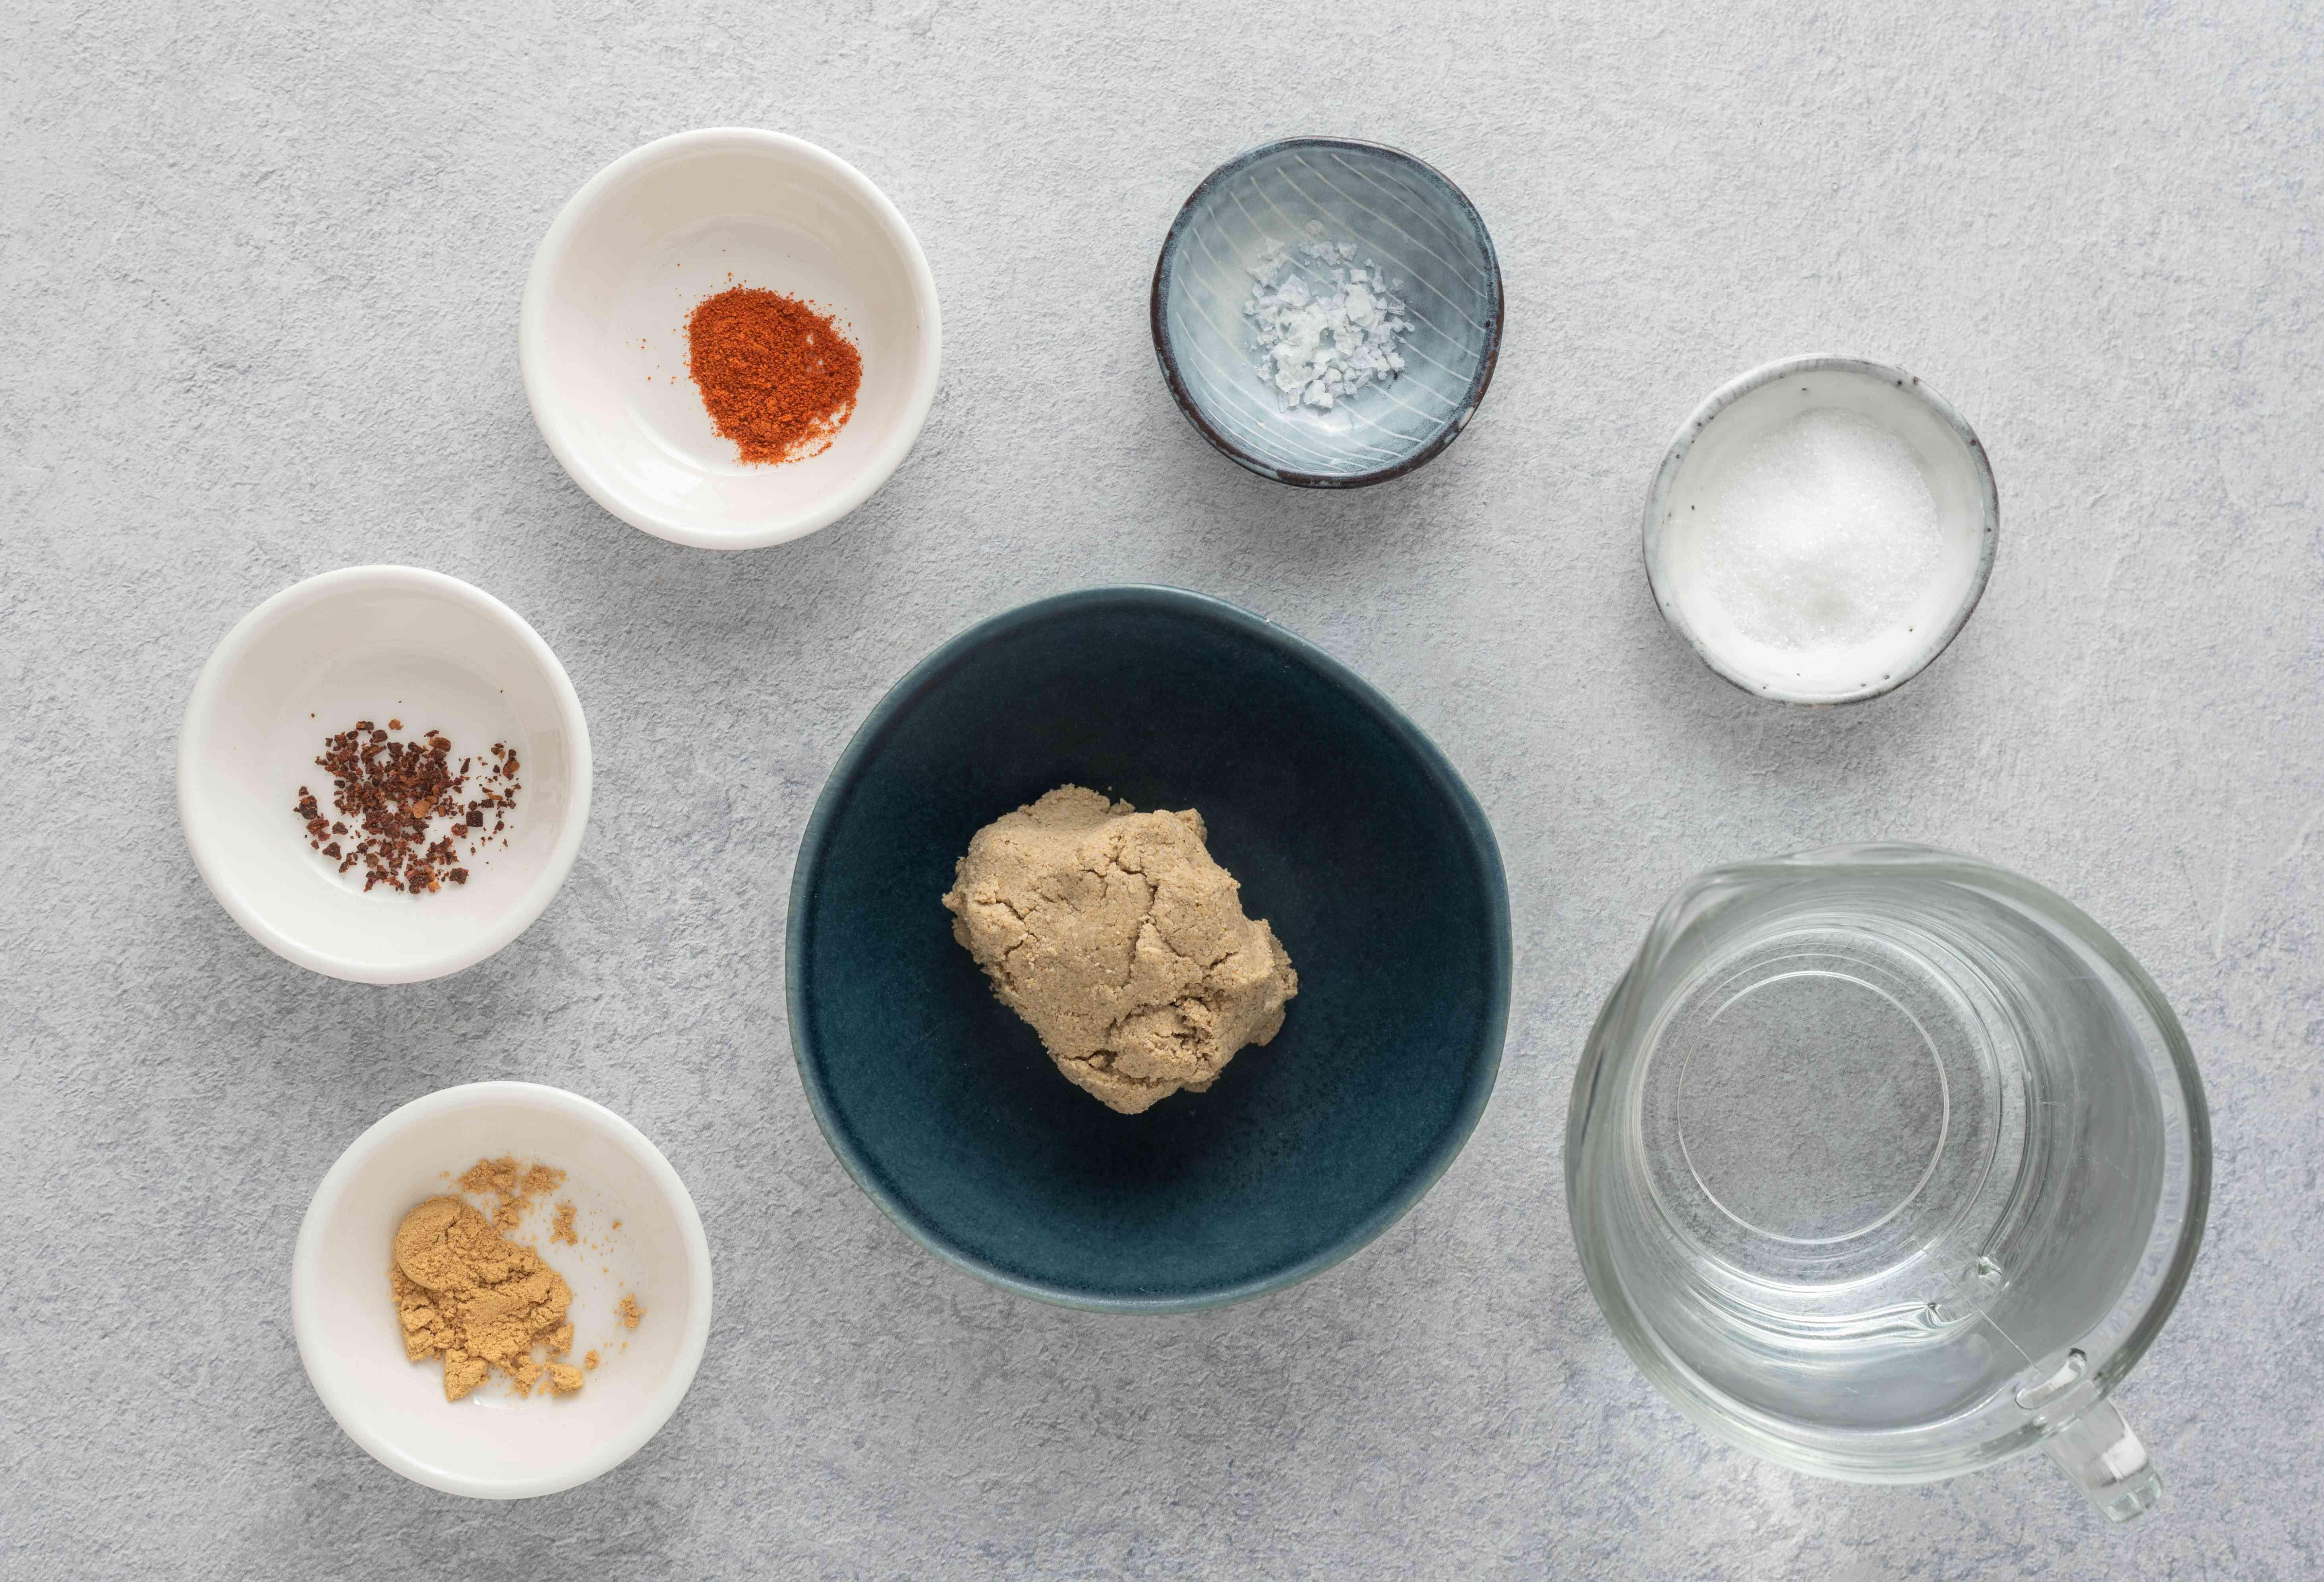 Hausa Koko ingredients, fermented corn or millet dough, water, salt, ground clove, ginger, chili, sugar